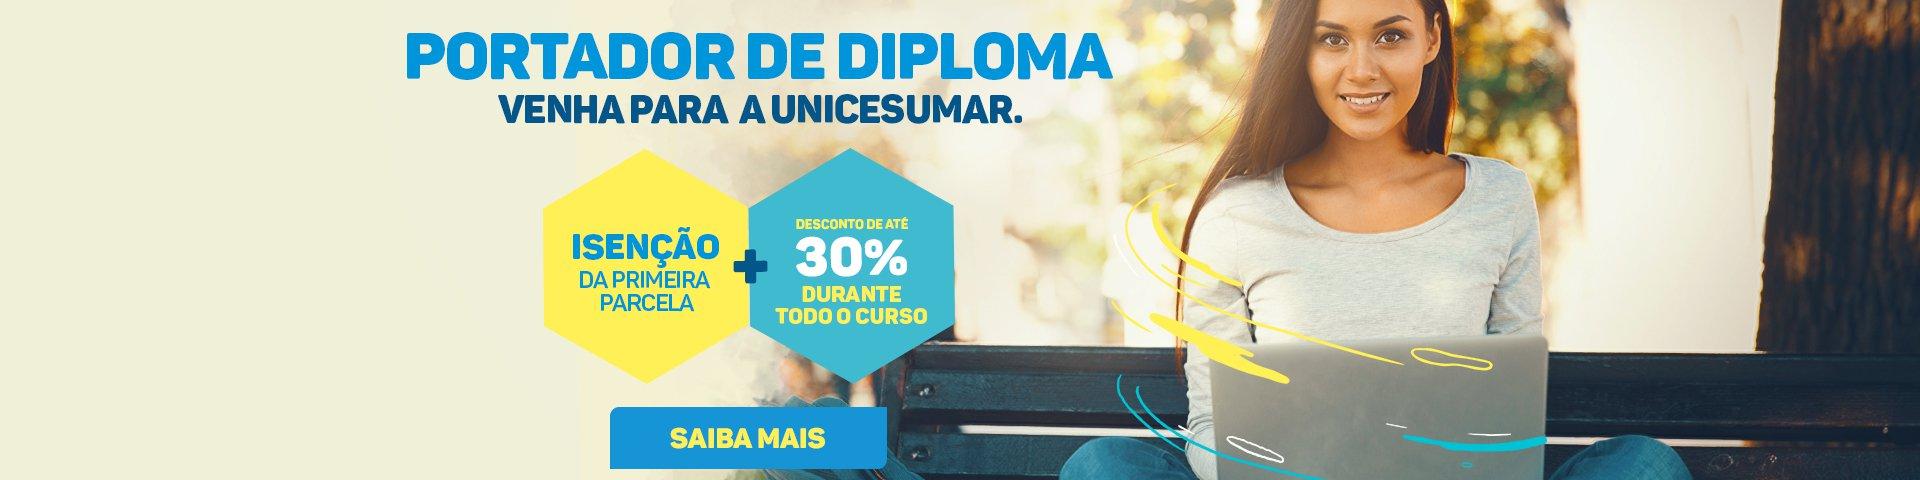 2457-bannerhome_diploma_1920x480px_30